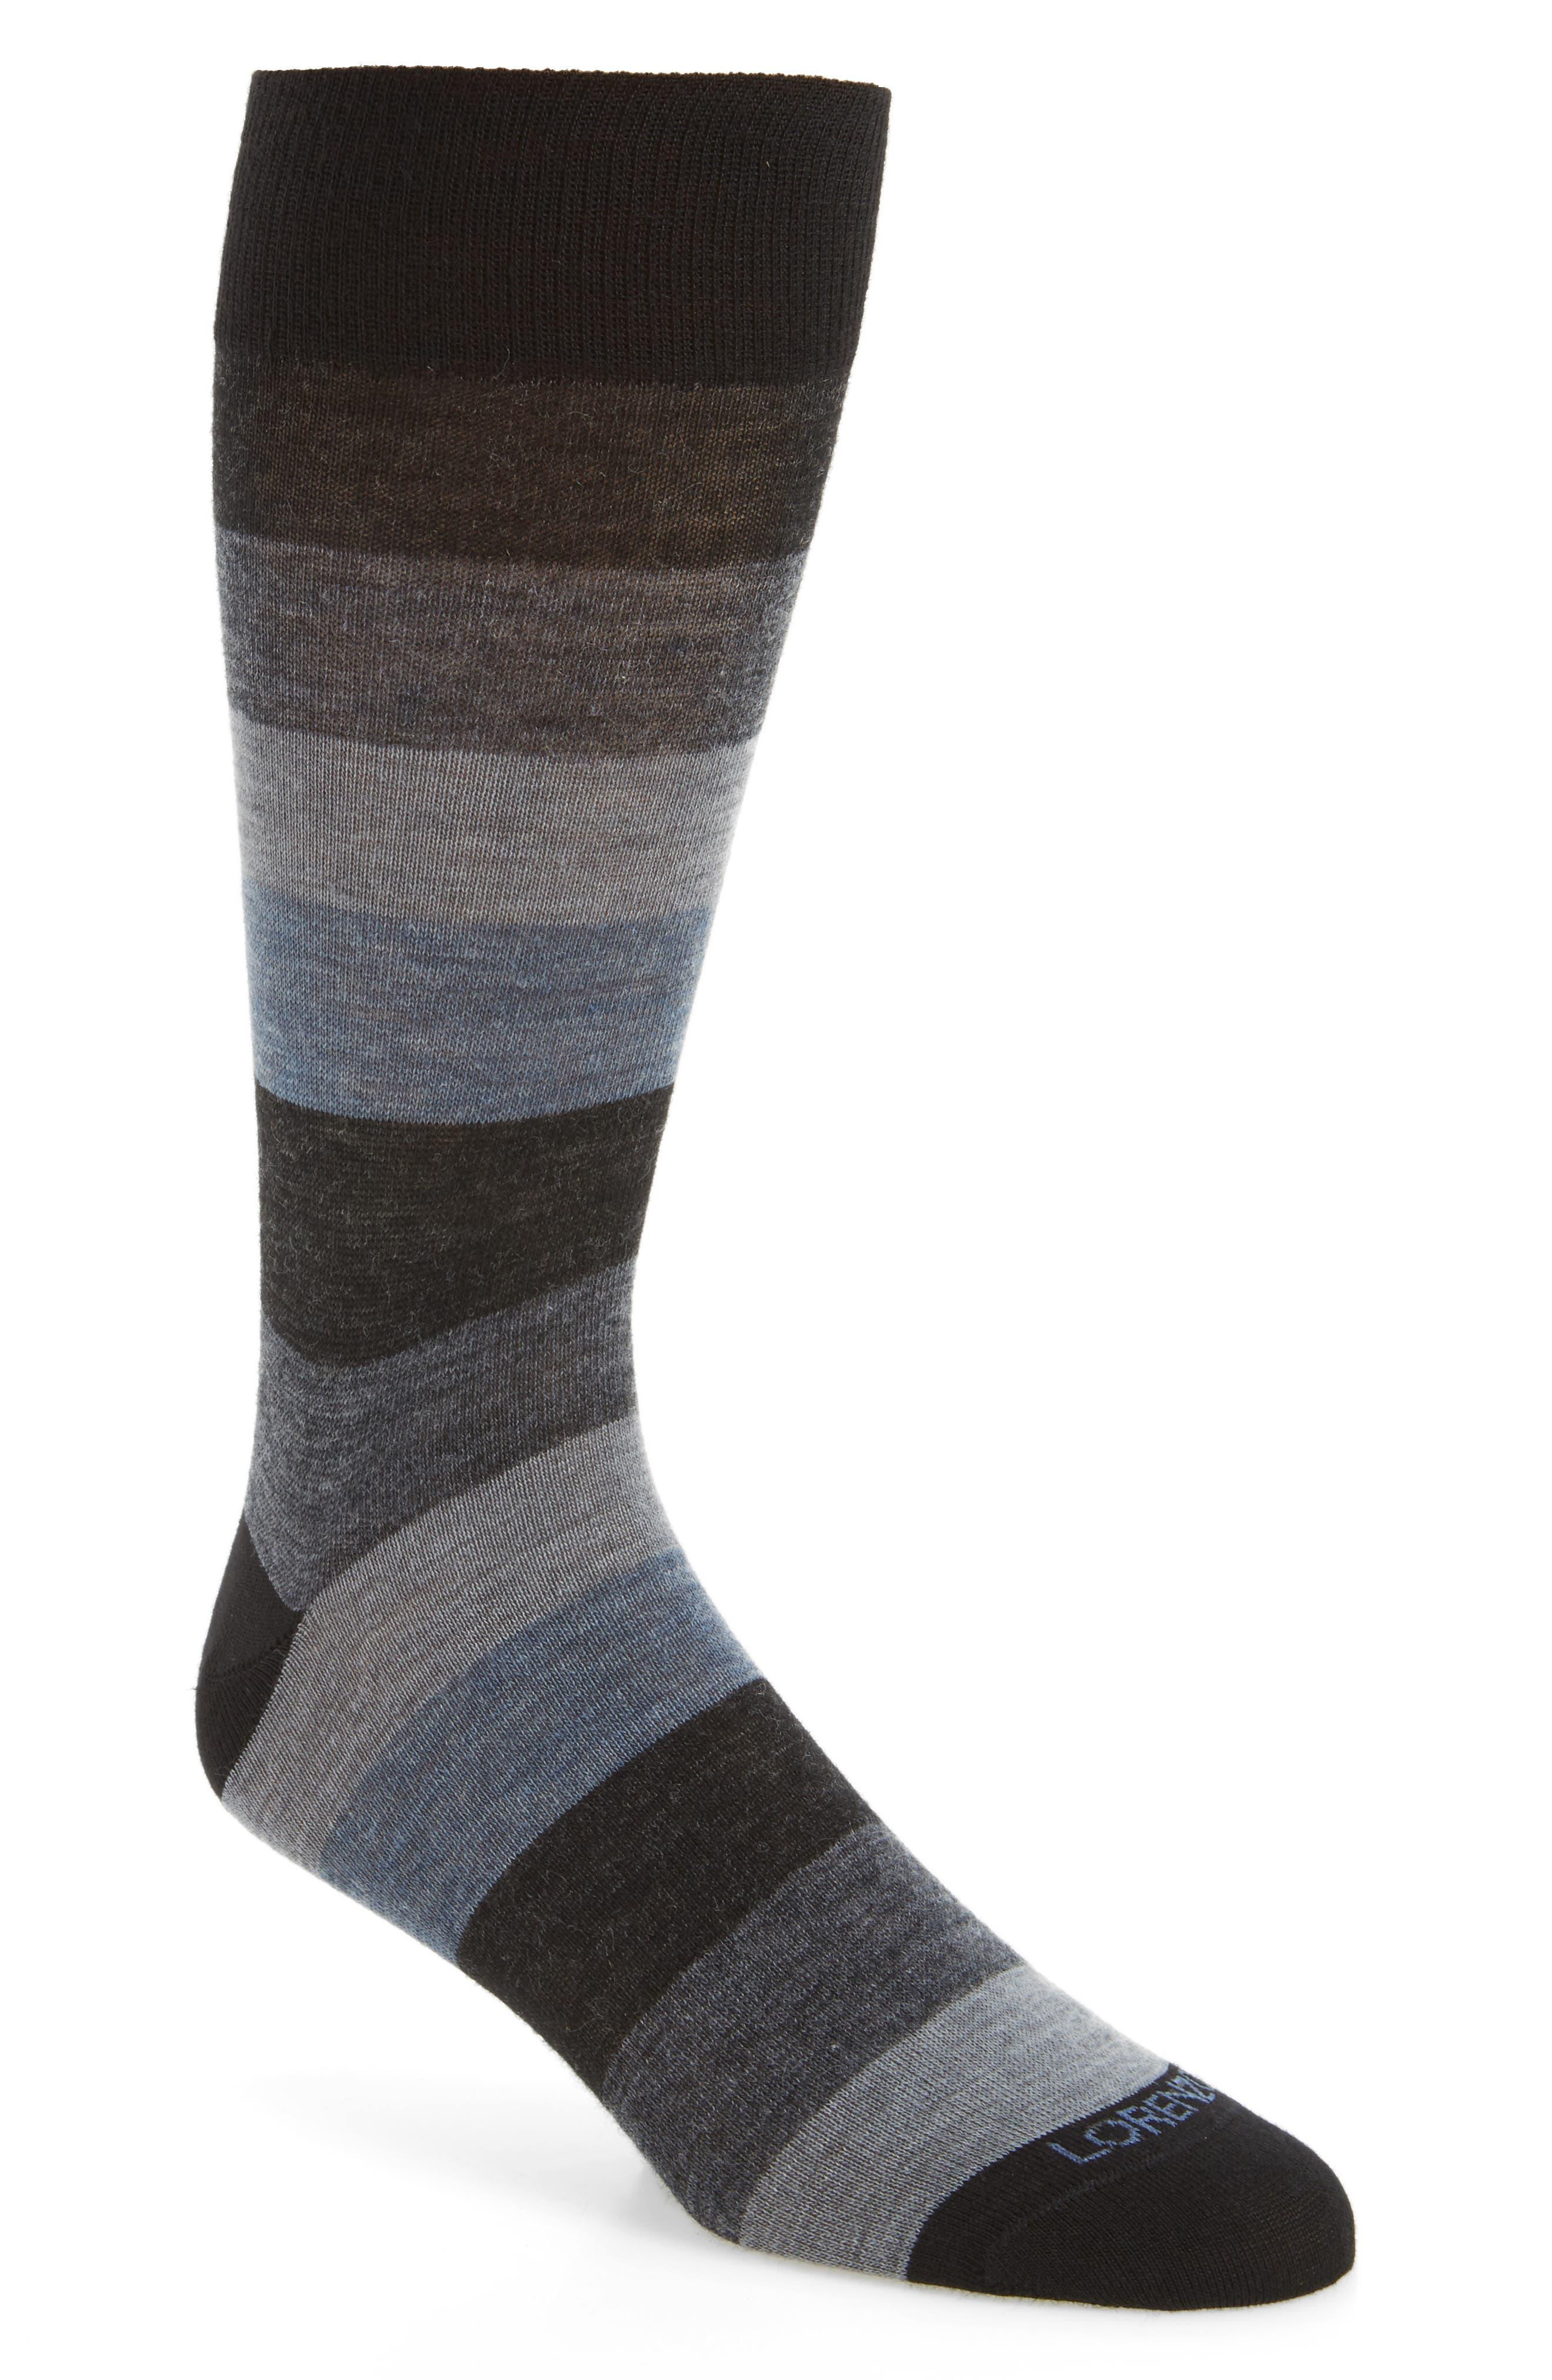 Alternate Image 1 Selected - Lorenzo Uomo Colorblock Socks (3 for $30)